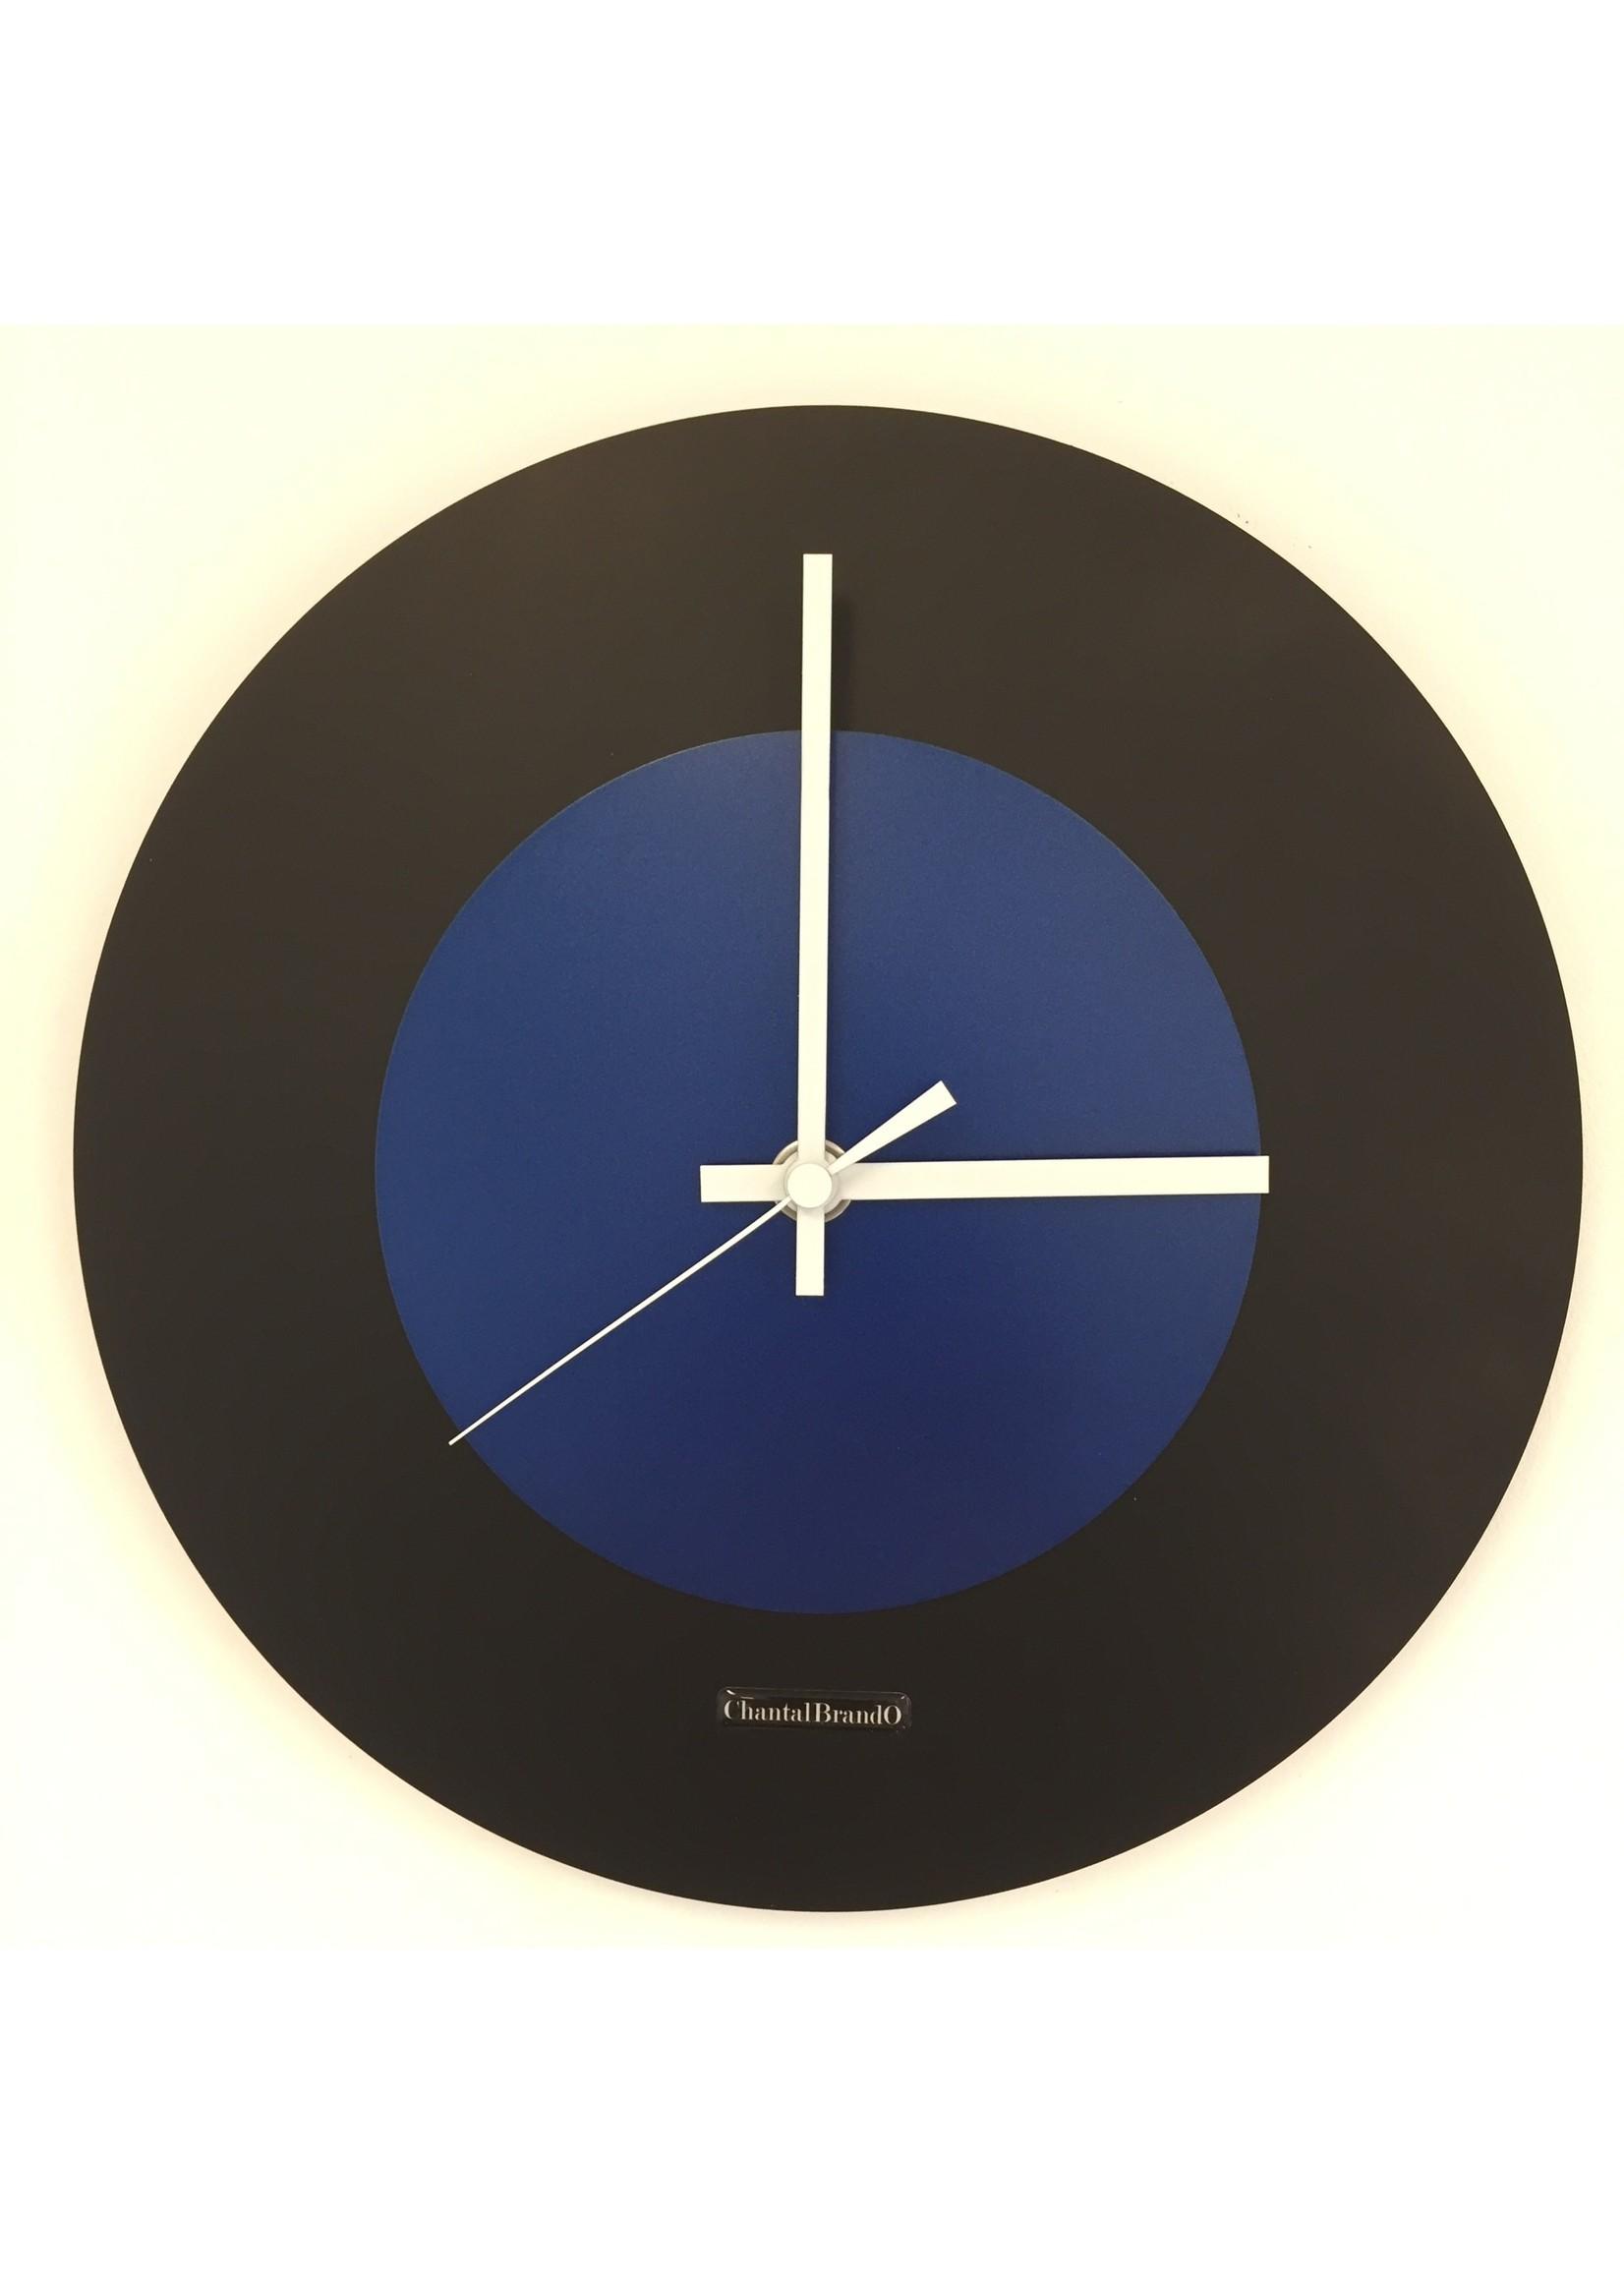 ChantalBrandO Wandklok Black & Blue modern Dutch Design